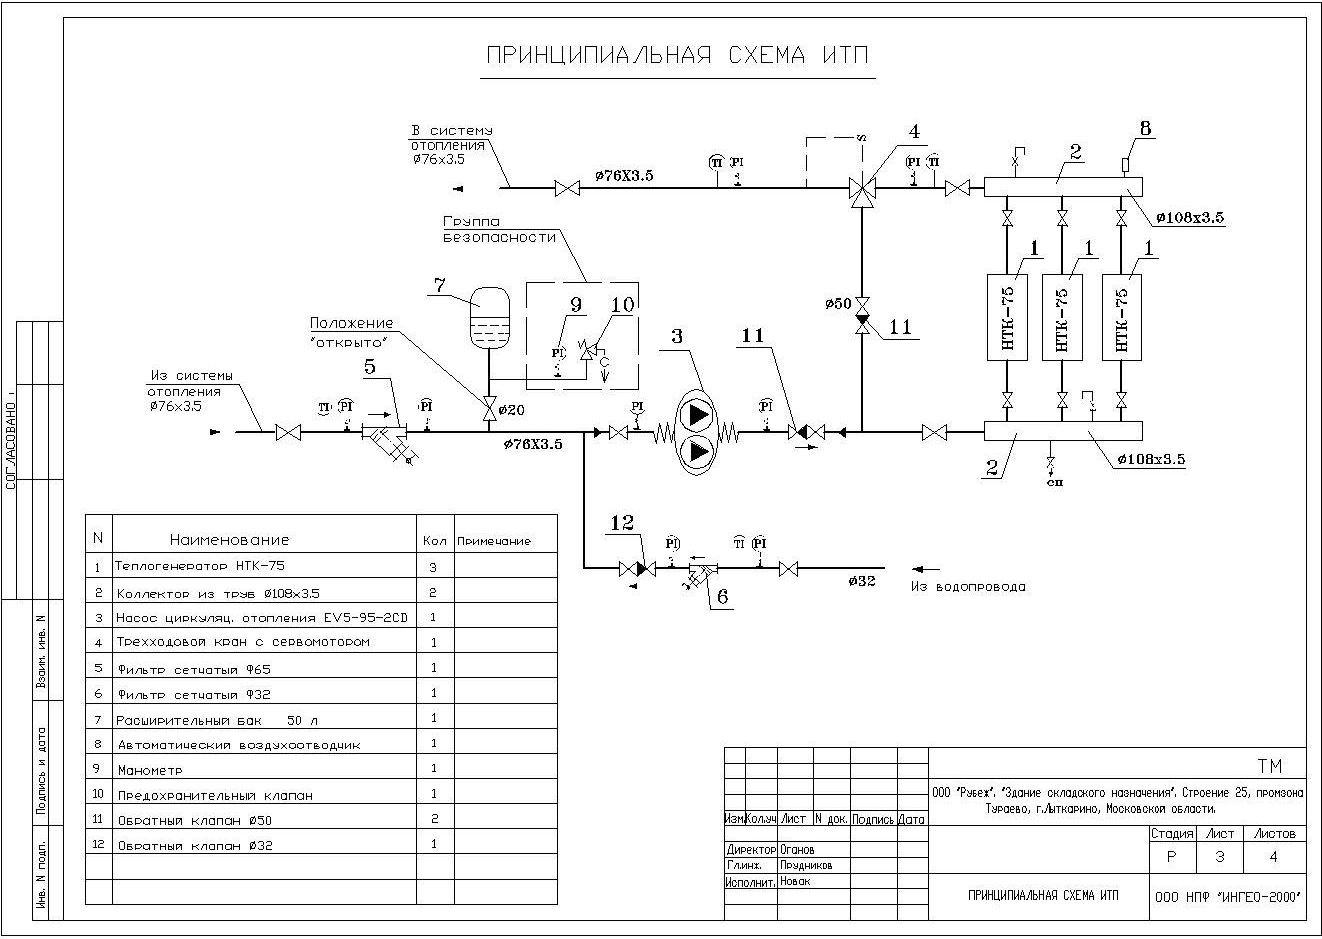 exampl-ITP-1-2.jpg